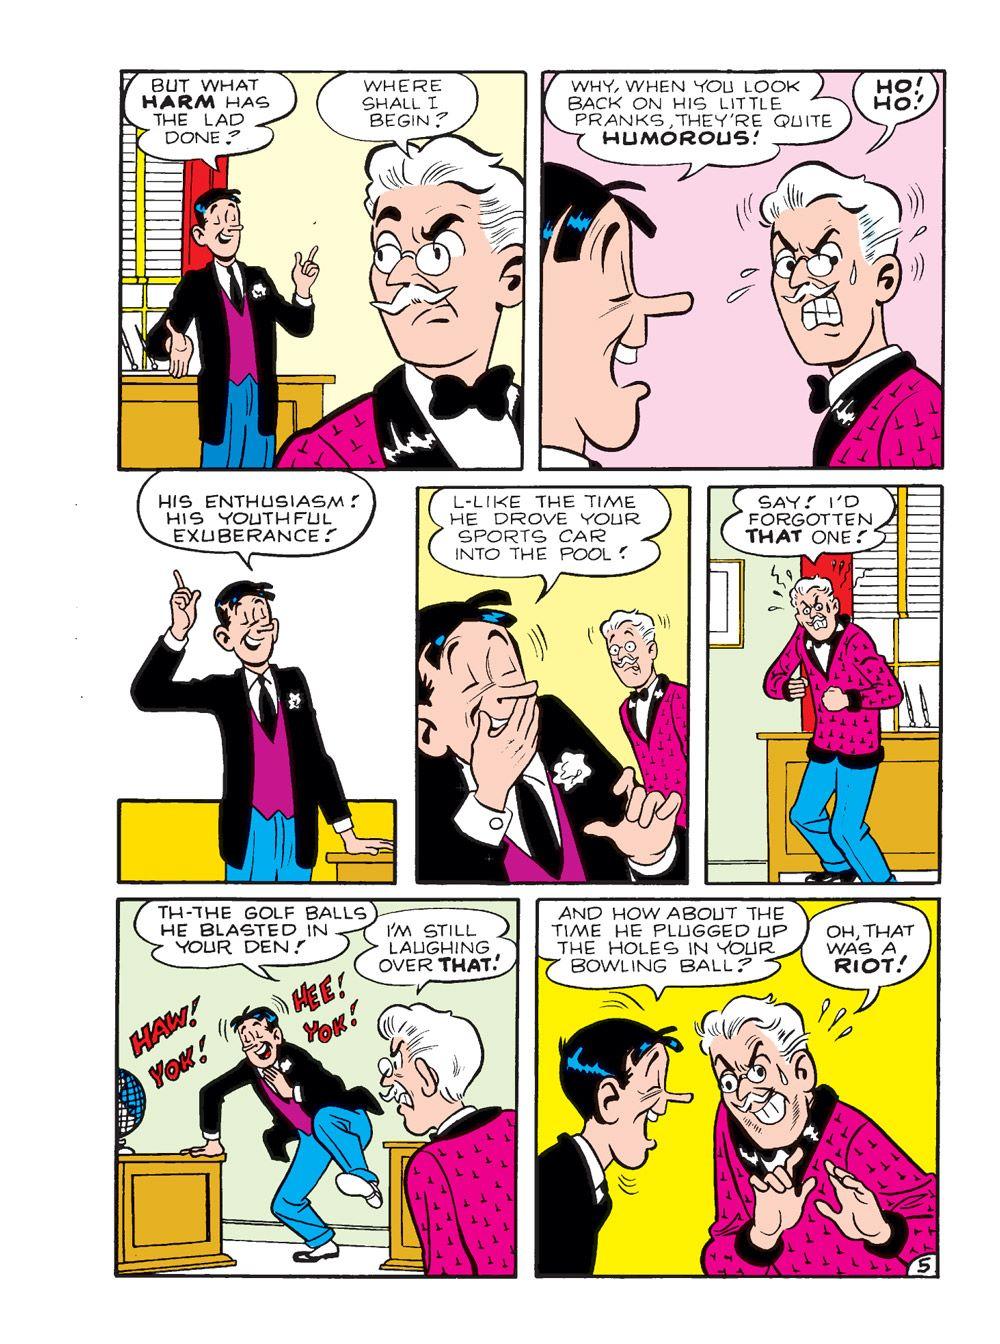 WorldOfArchieJumboComicsDigest_109-140 ComicList Previews: WORLD OF ARCHIE JUMBO COMICS DIGEST #109